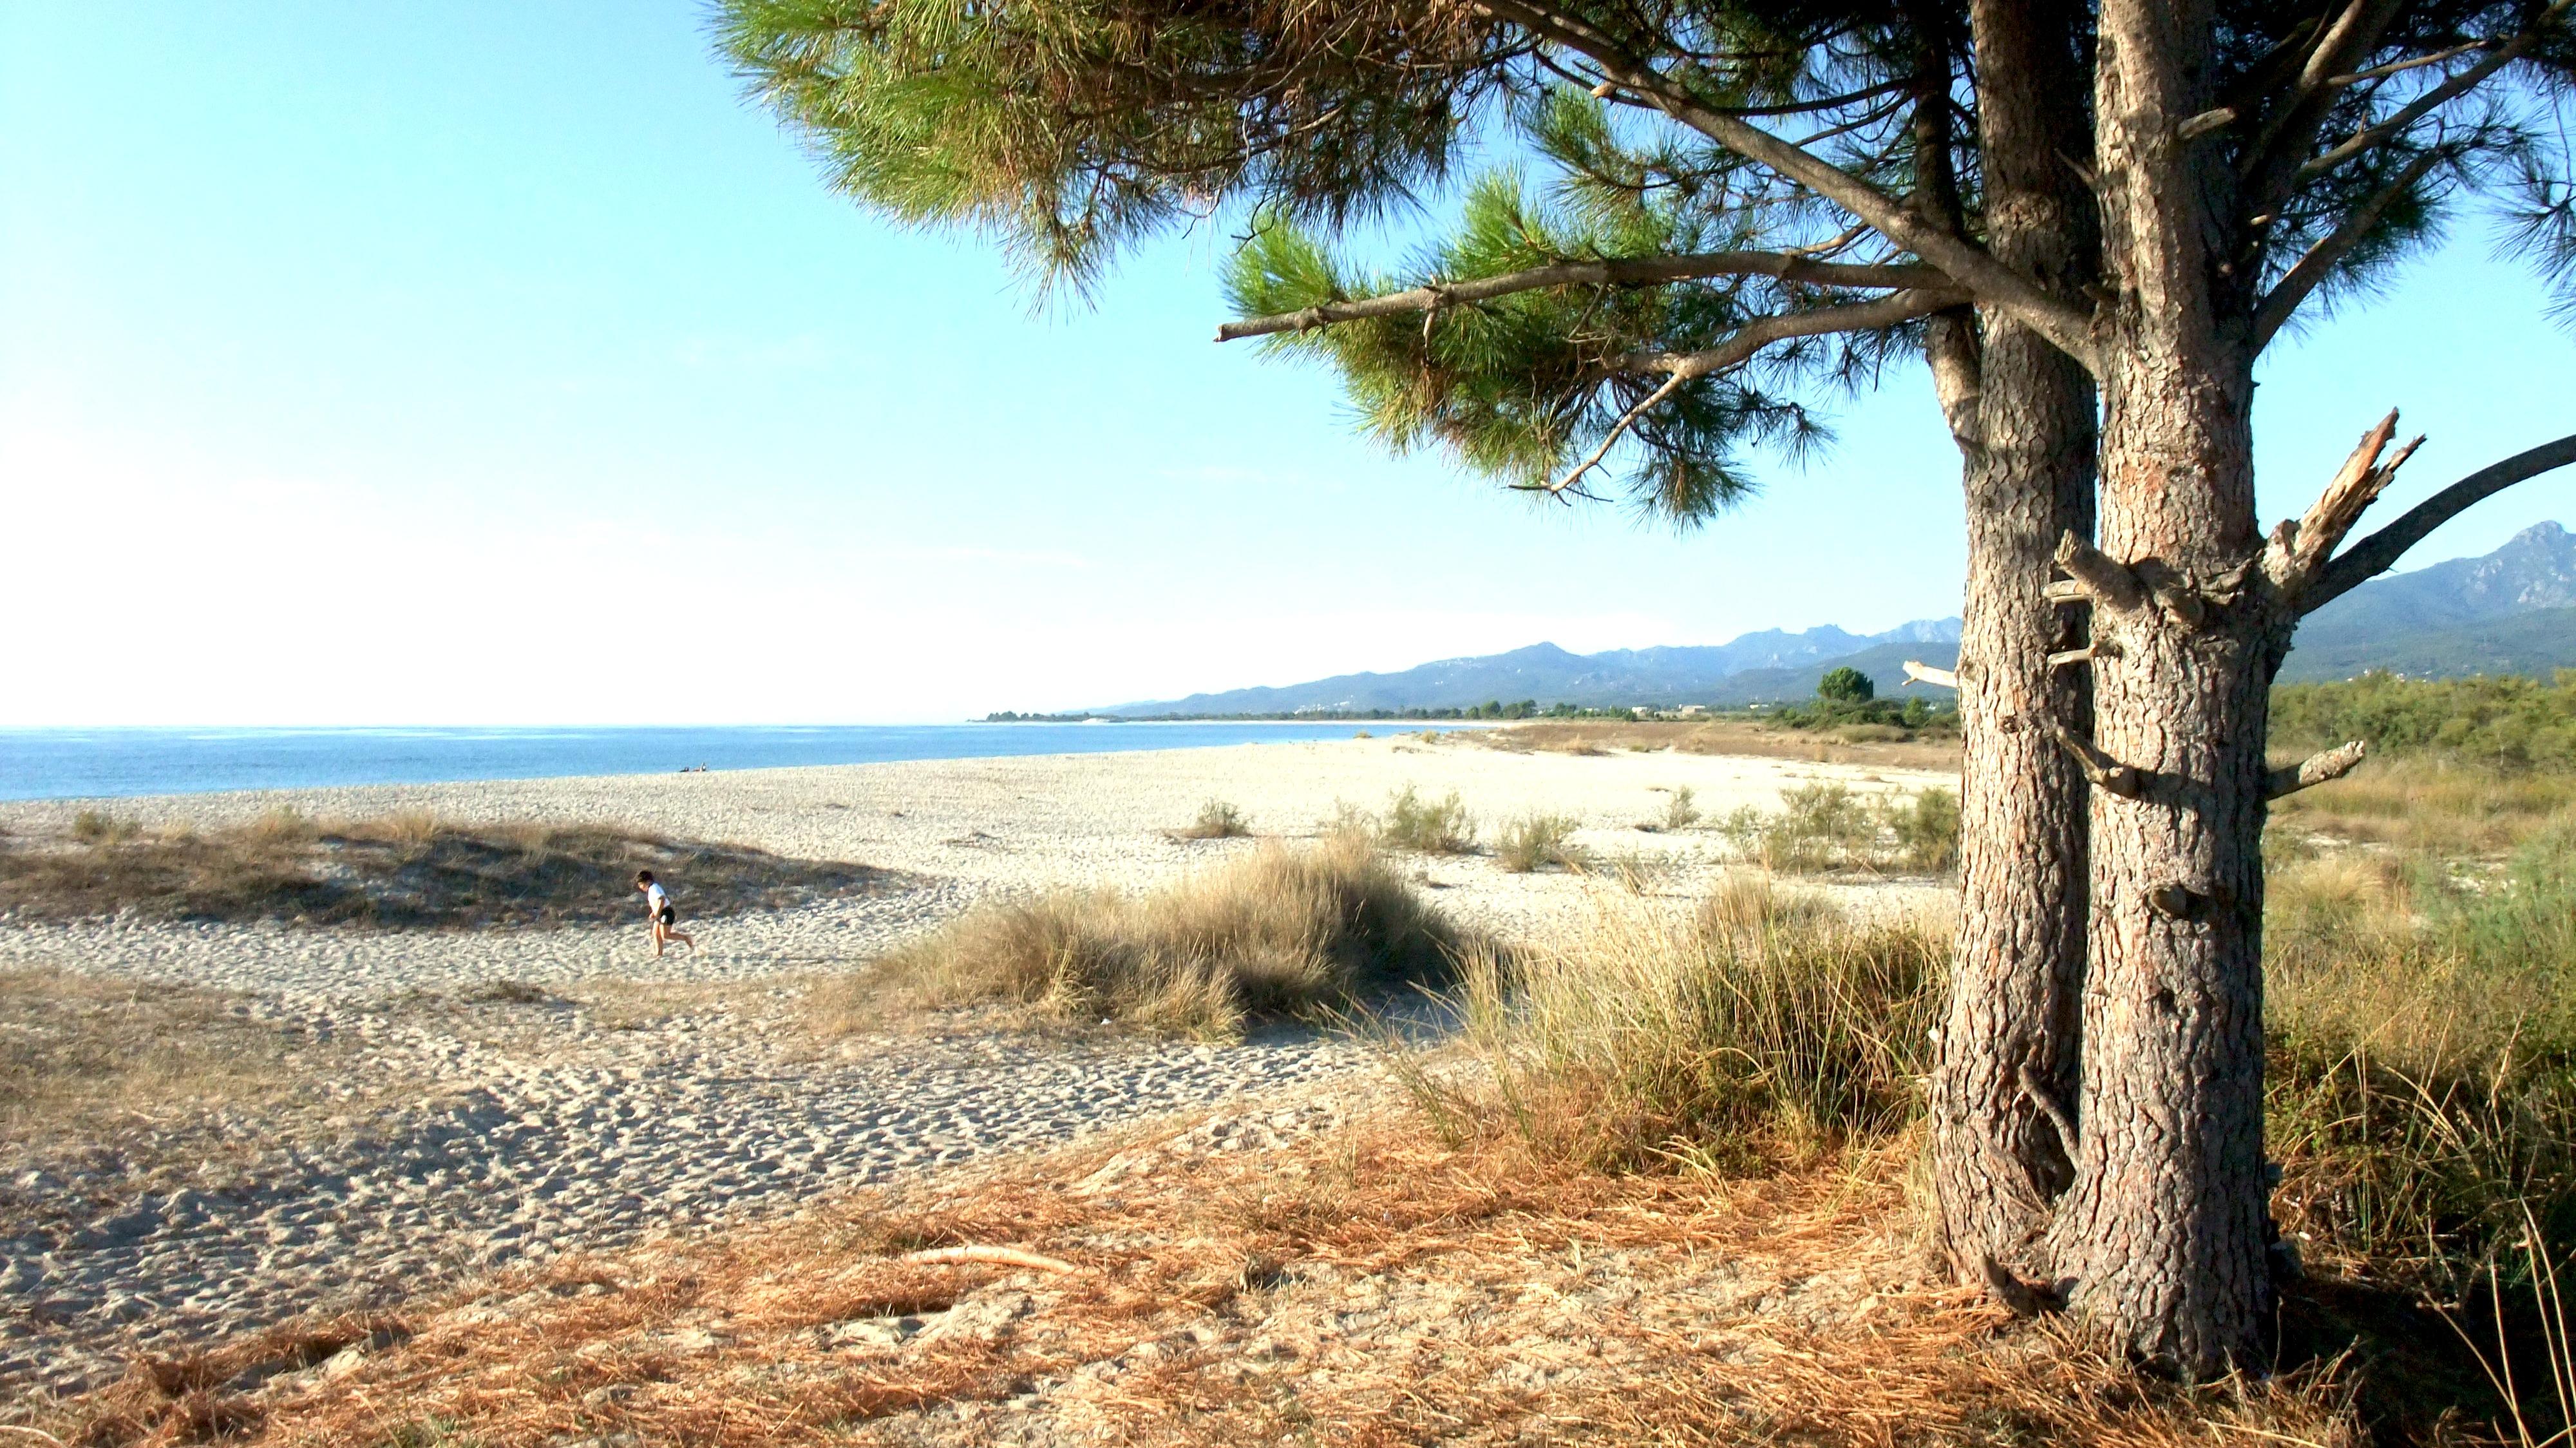 Korsika Ferienhaus mit Hund